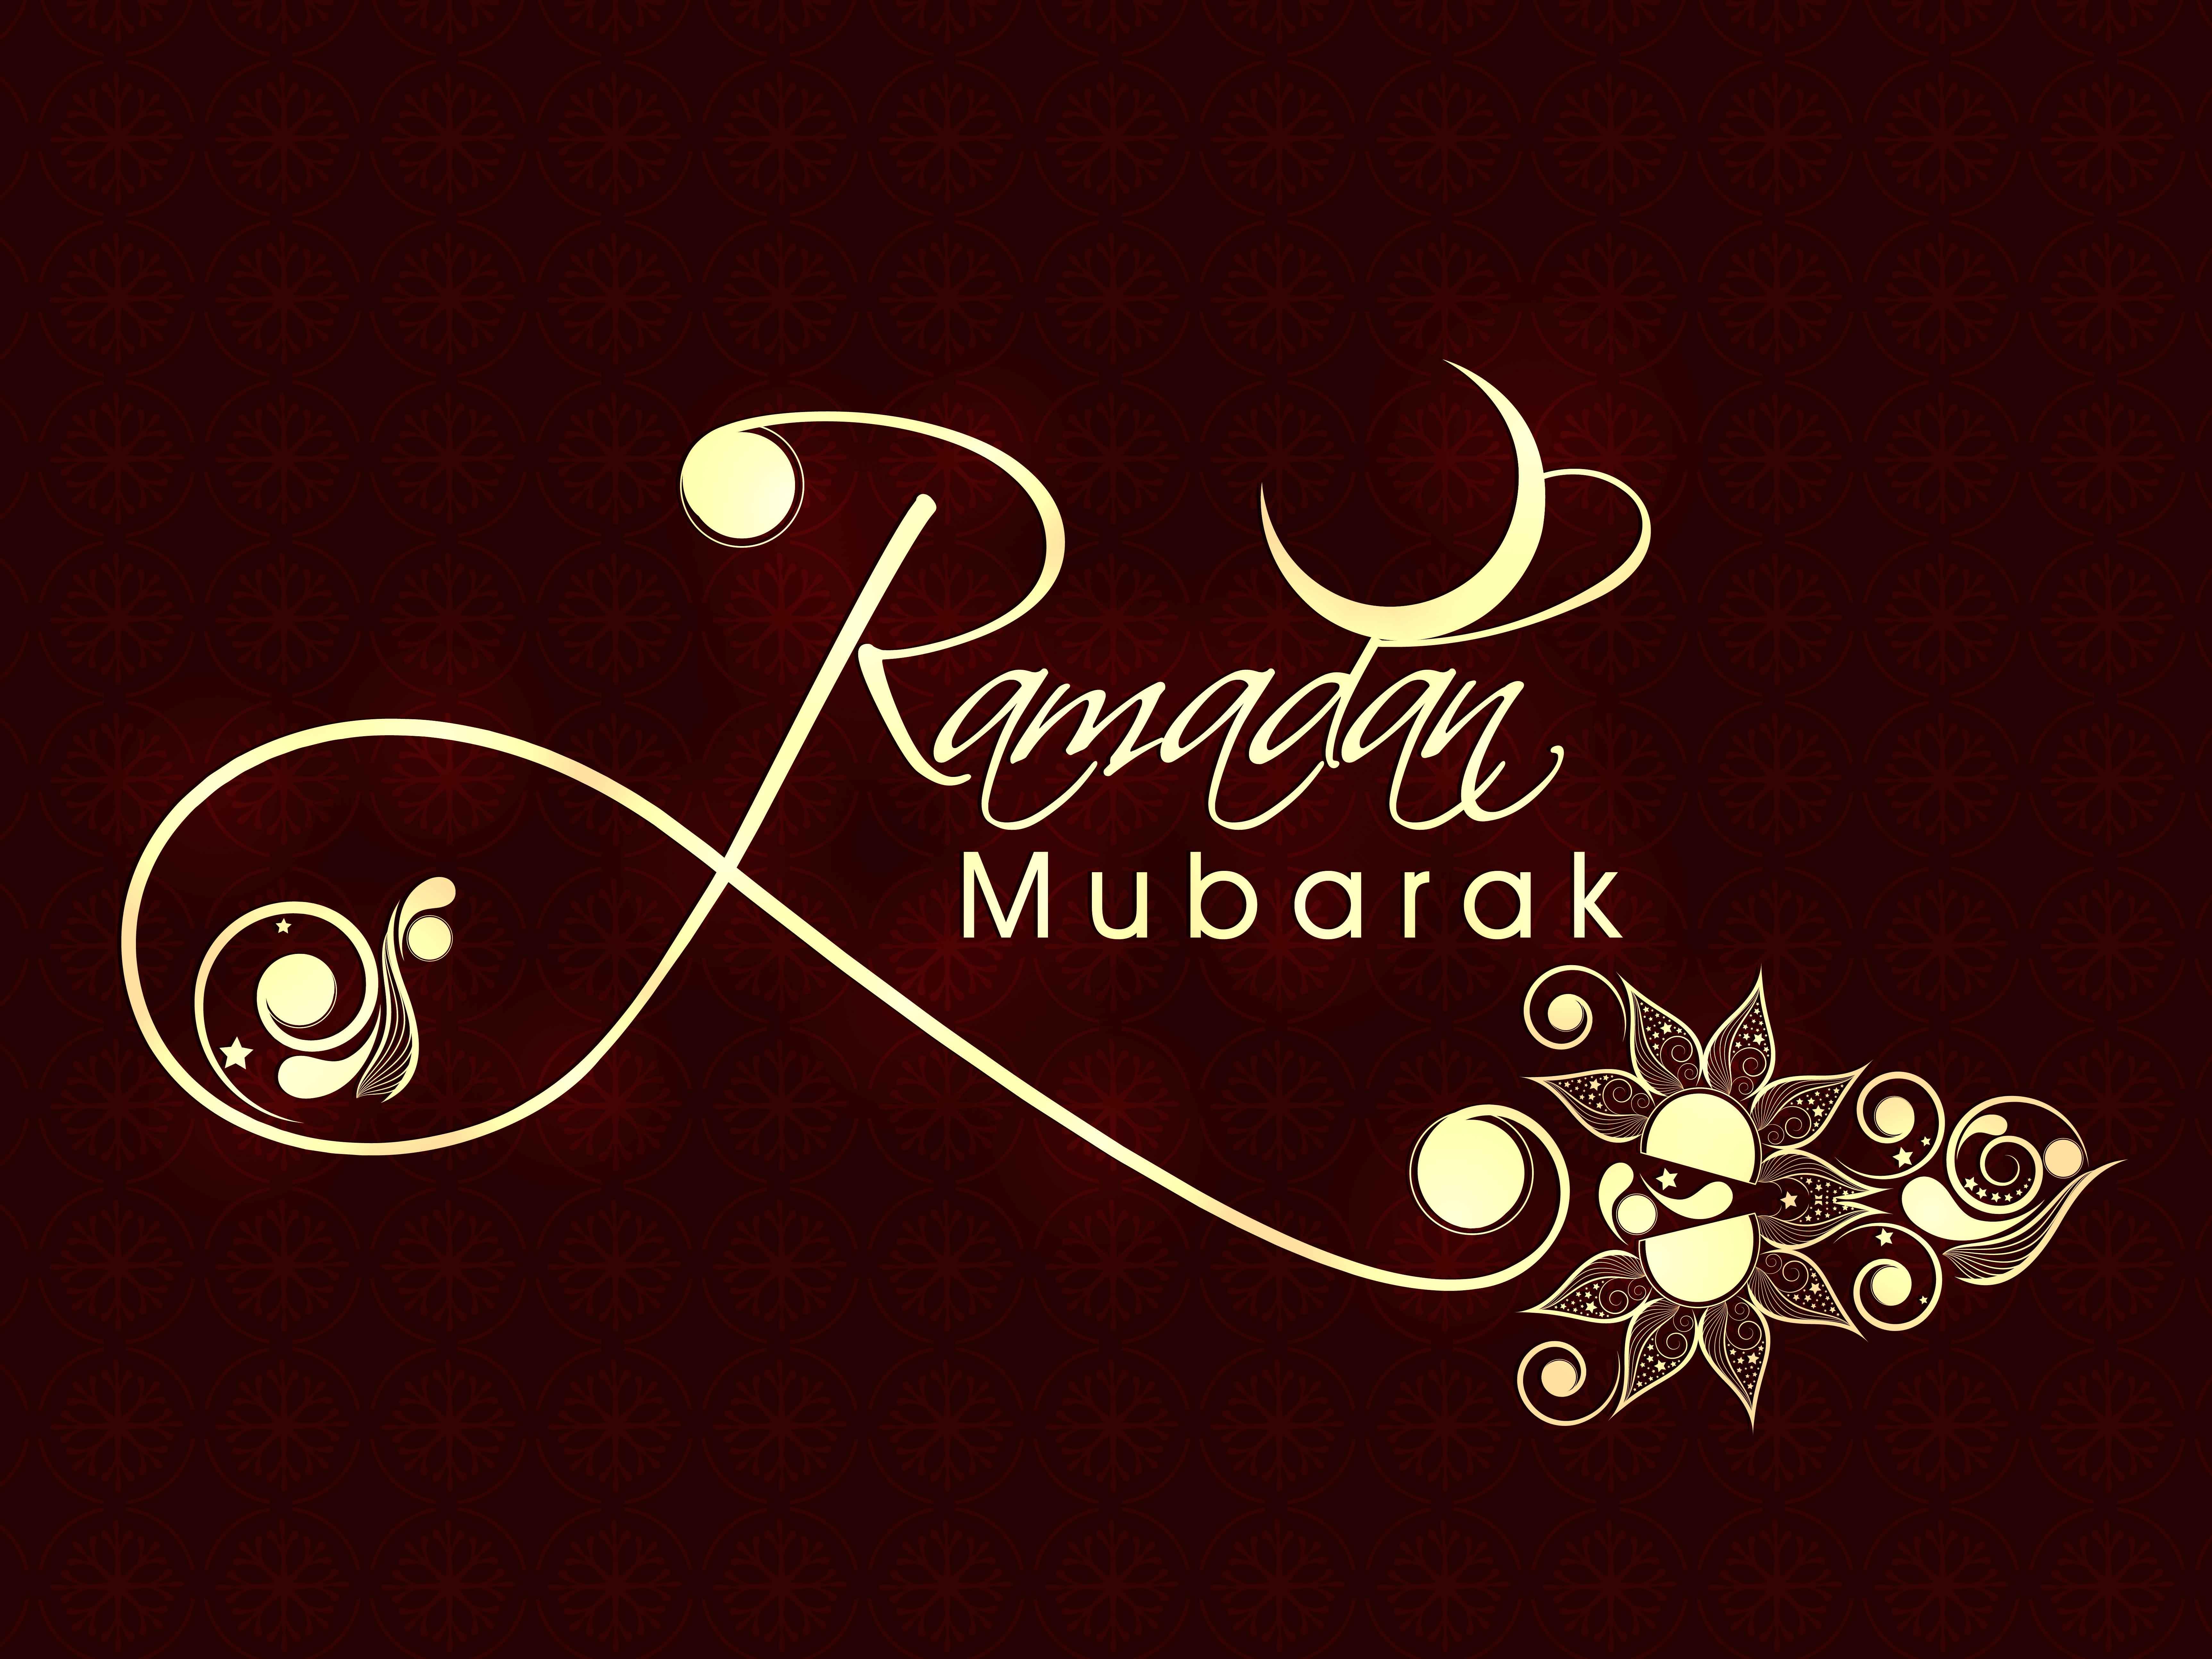 Eid Mubarak In Arabic Kaligrafi